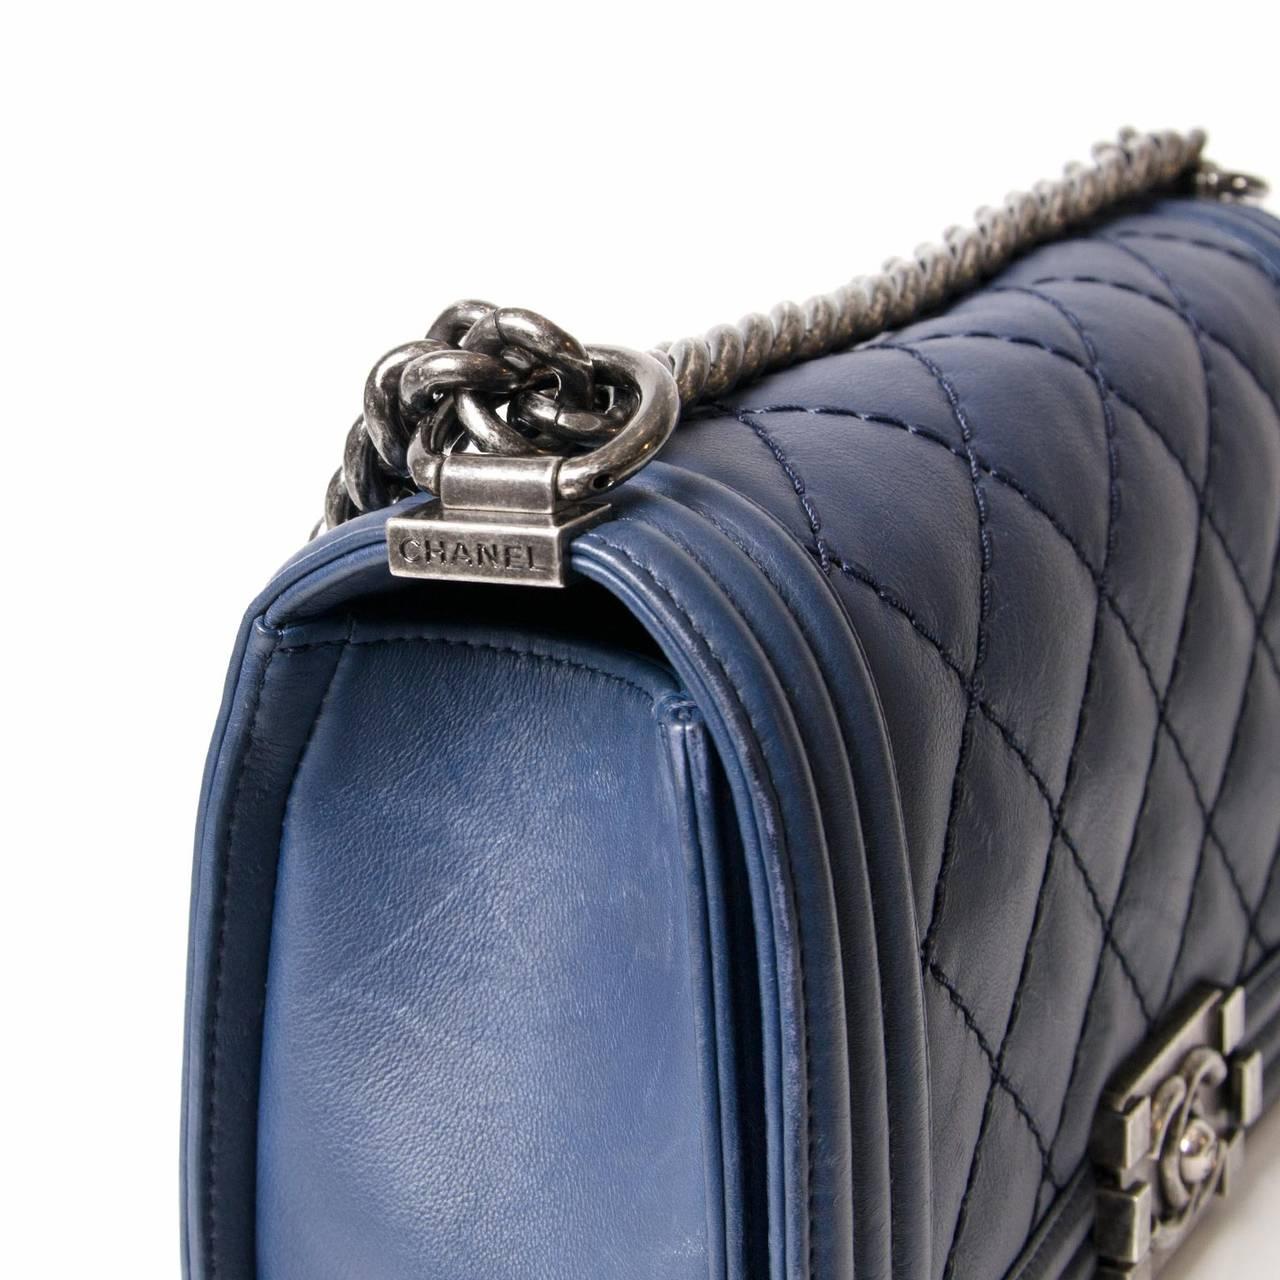 Chanel Lambskin Medium Quilted Boy Bag 3